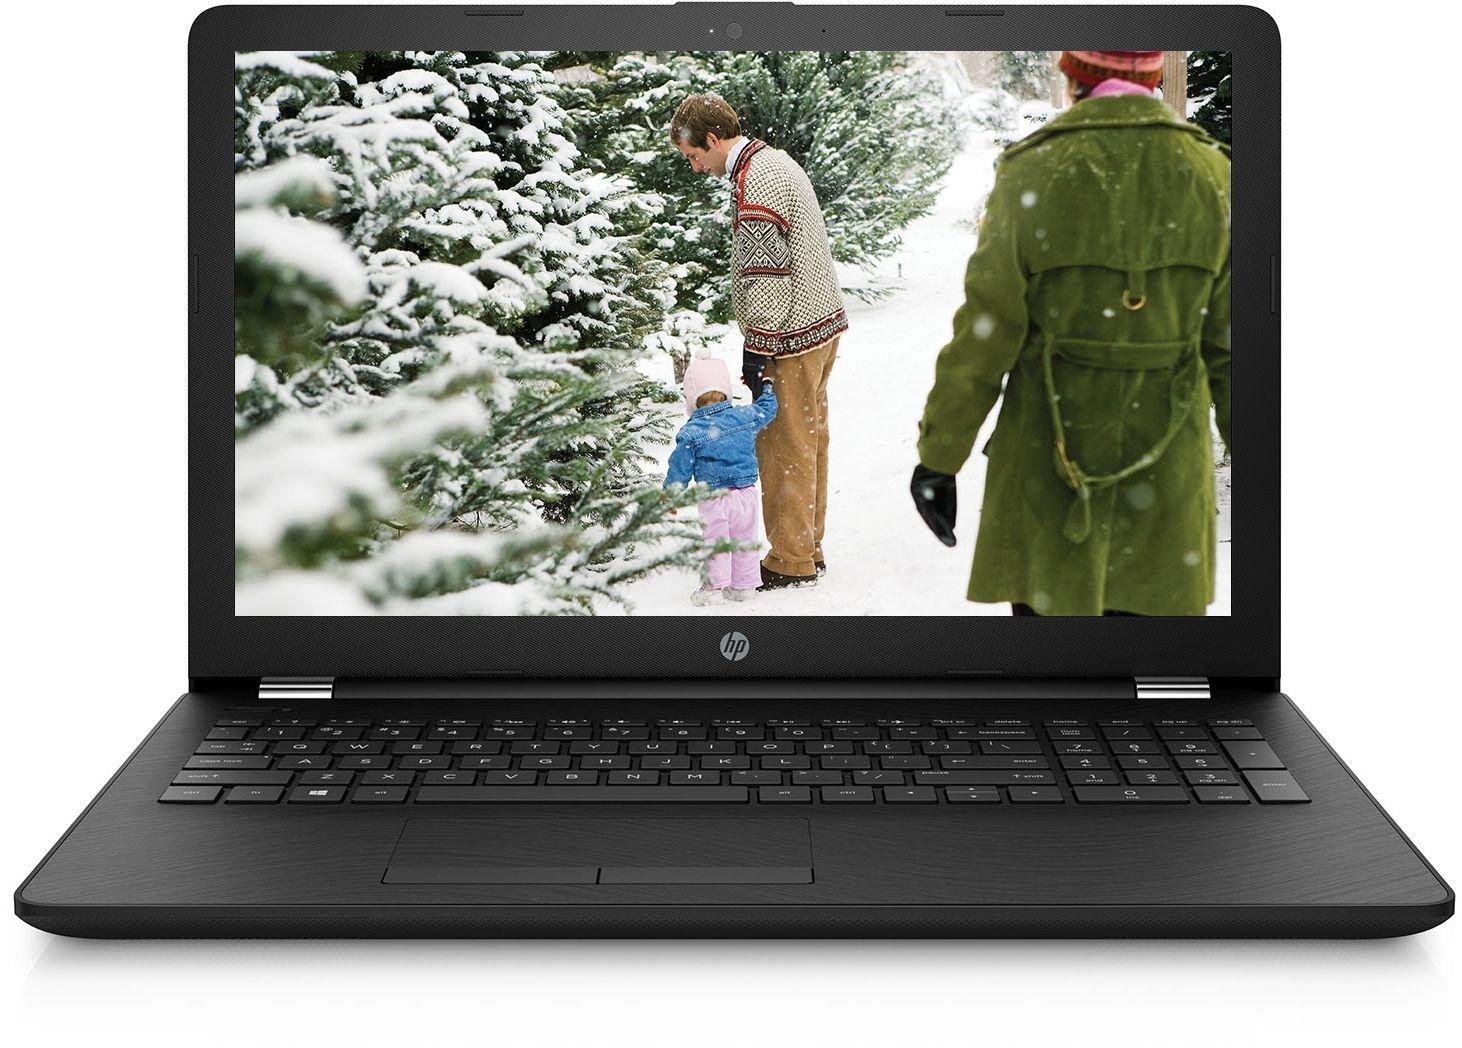 HP 15-BS580TX 2017 15.6-inch Laptop (6th Gen Core i3-6006U/8GB/1TB/Windows 10/2GB AMD 520 Graphics), Sparkling Black